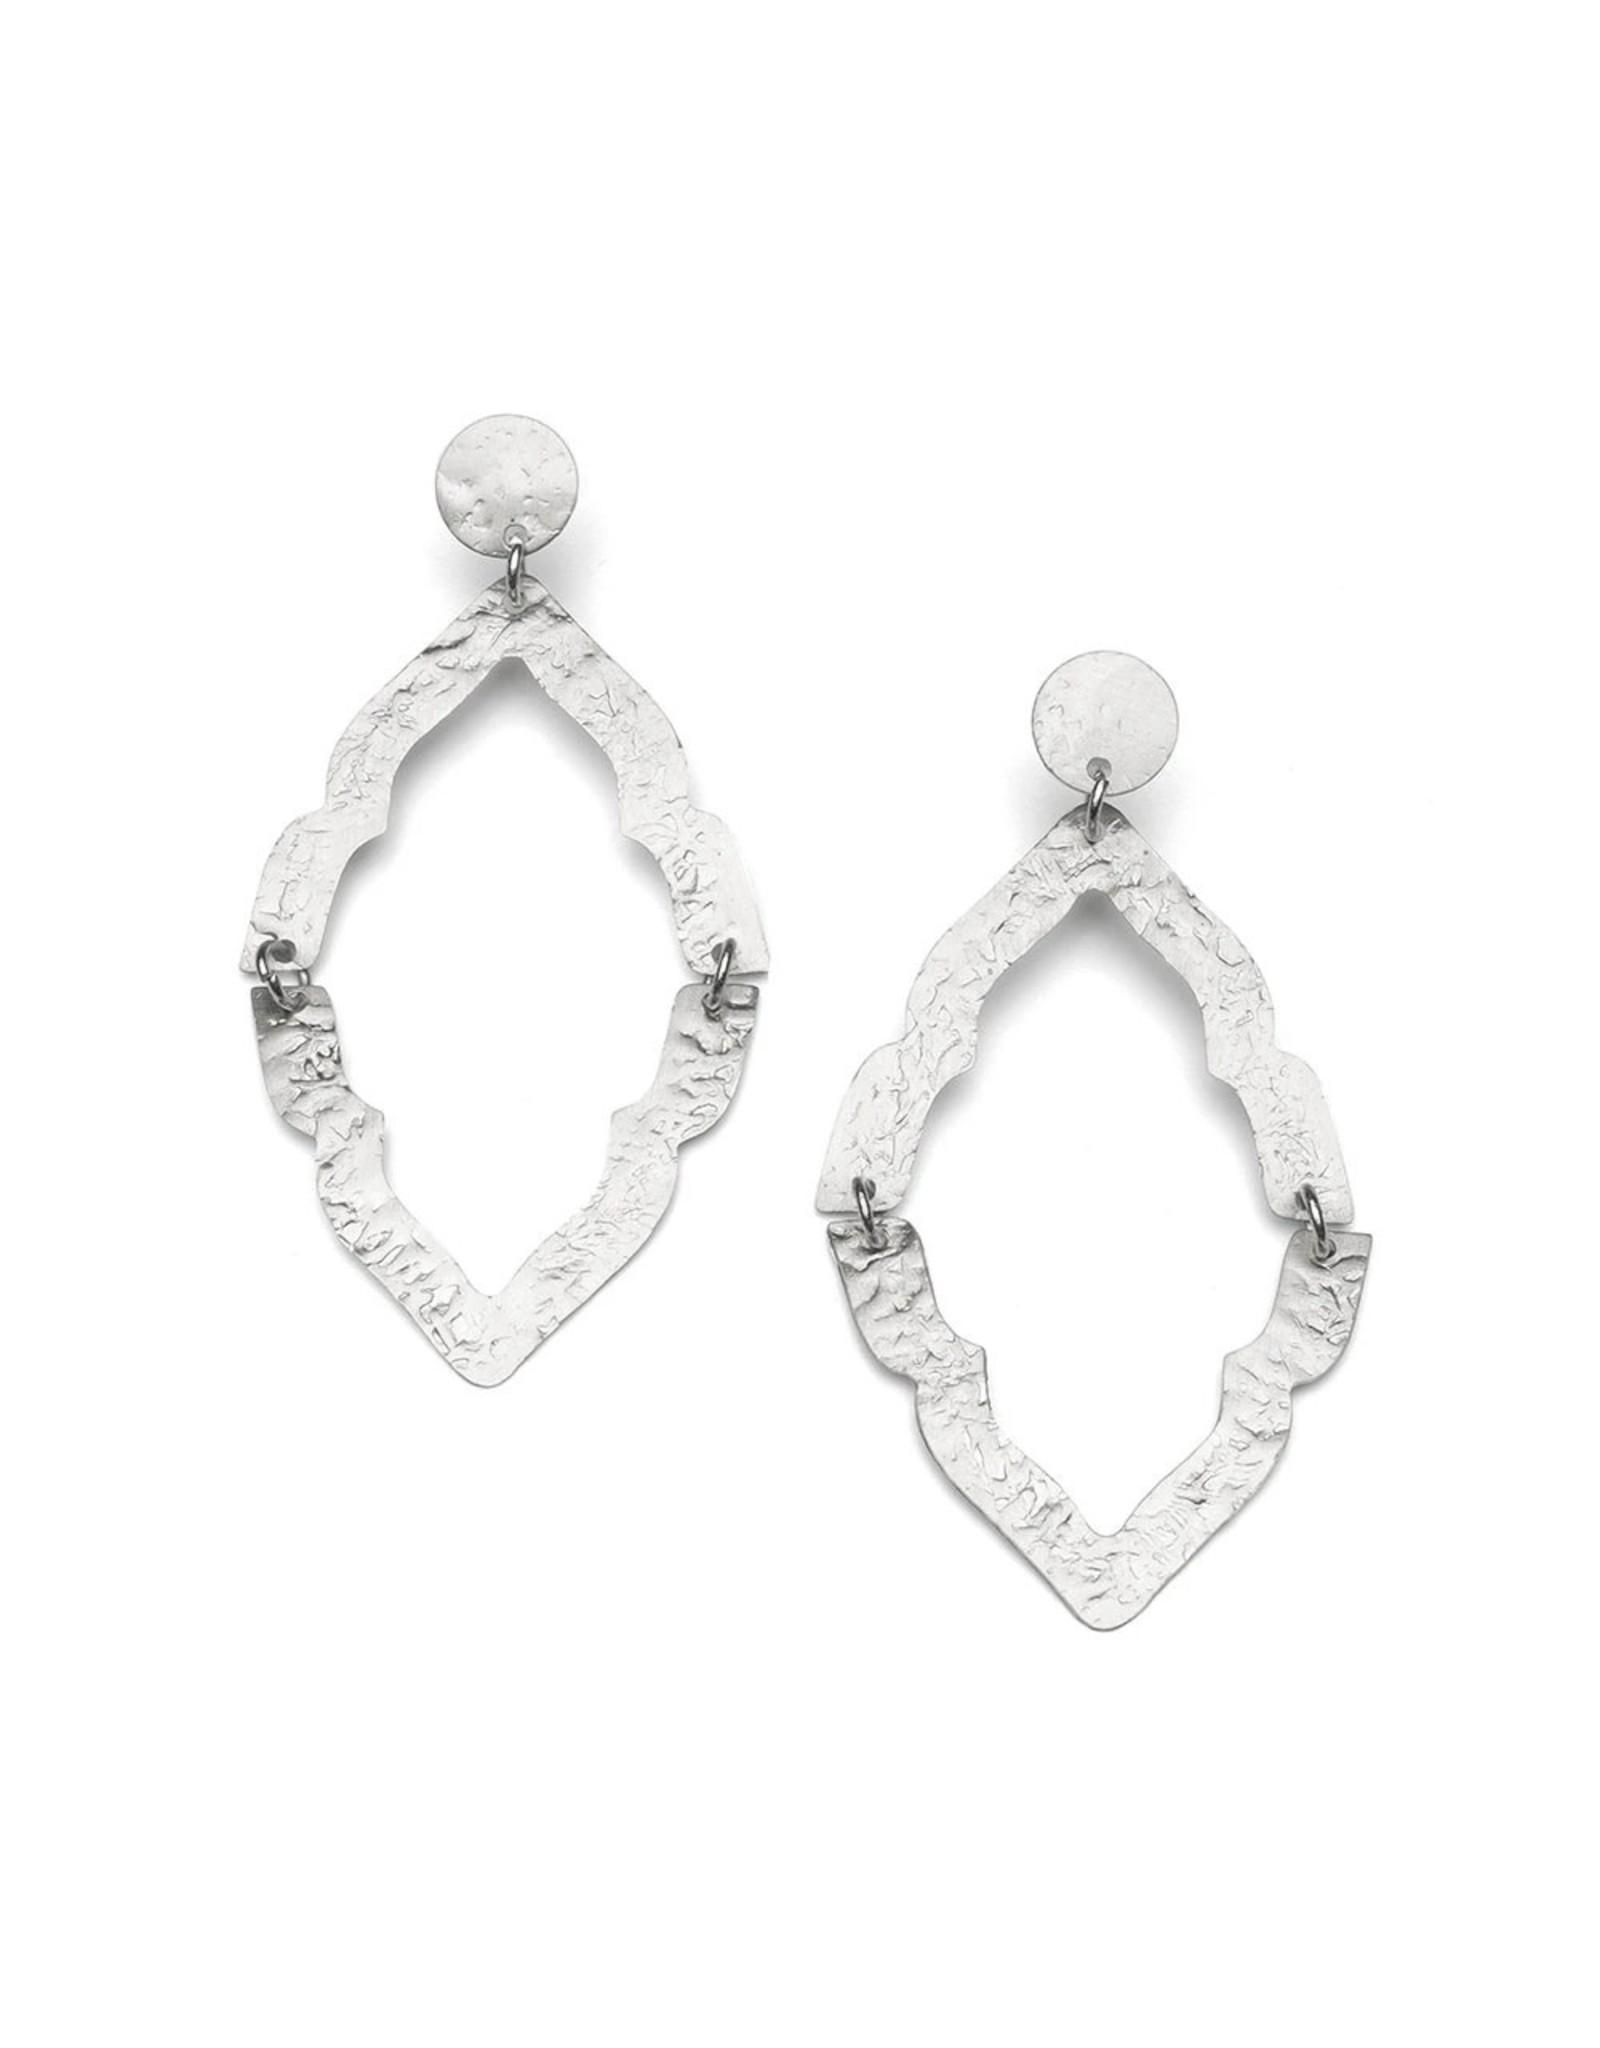 Matr Boomie Nihira Ashram Window Earring- Silver. India